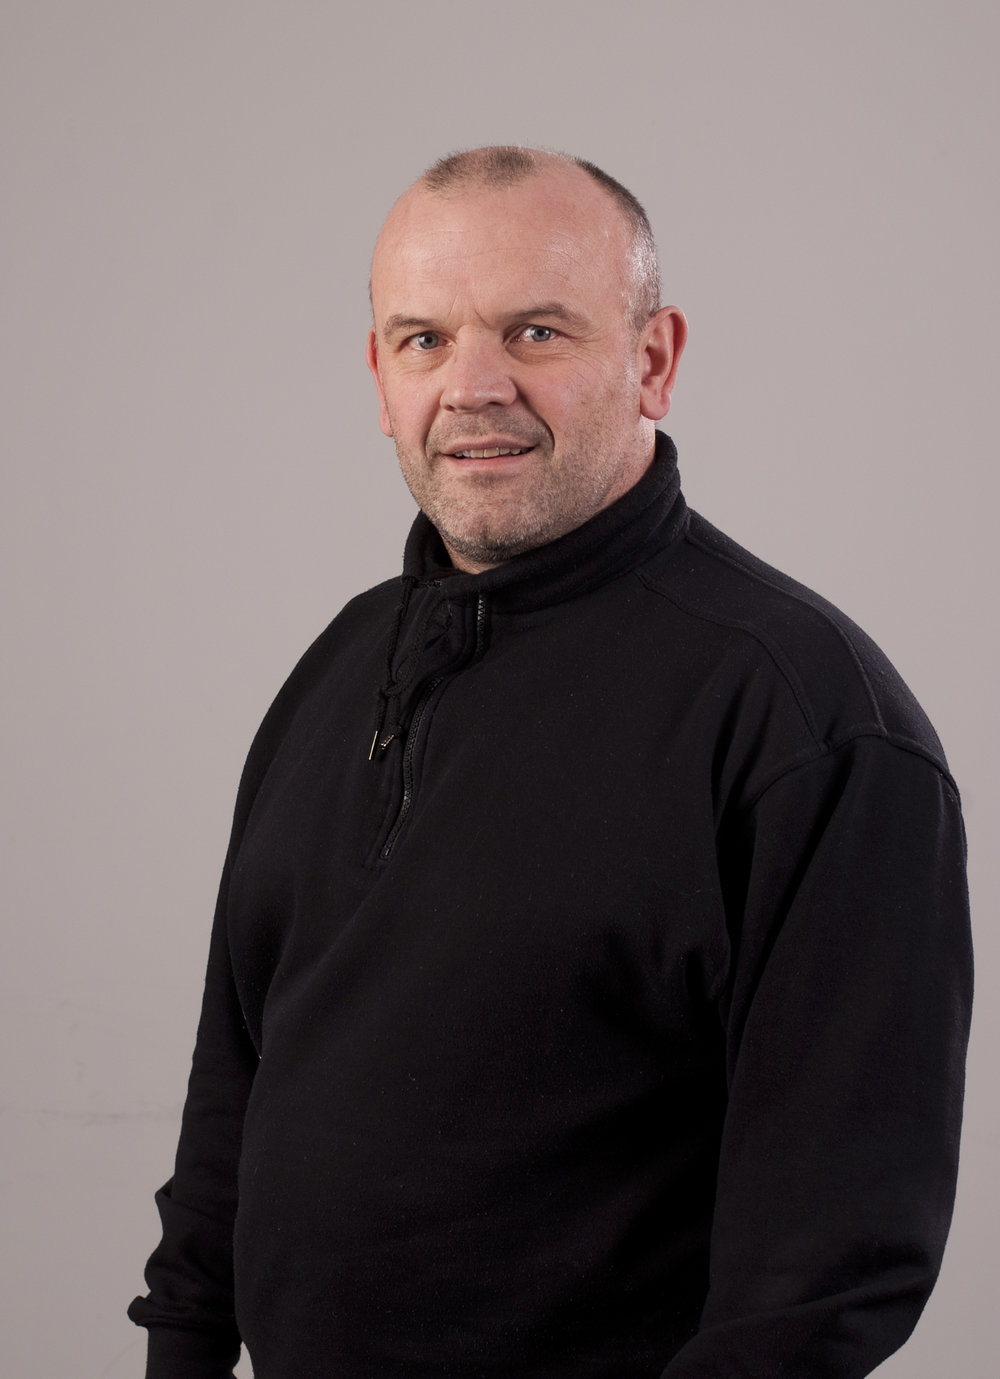 Jan Gunnar Østerhus   Daglig leder  +47 402 36 140  josterhus@setpro.no  Arbeidssted: Valle